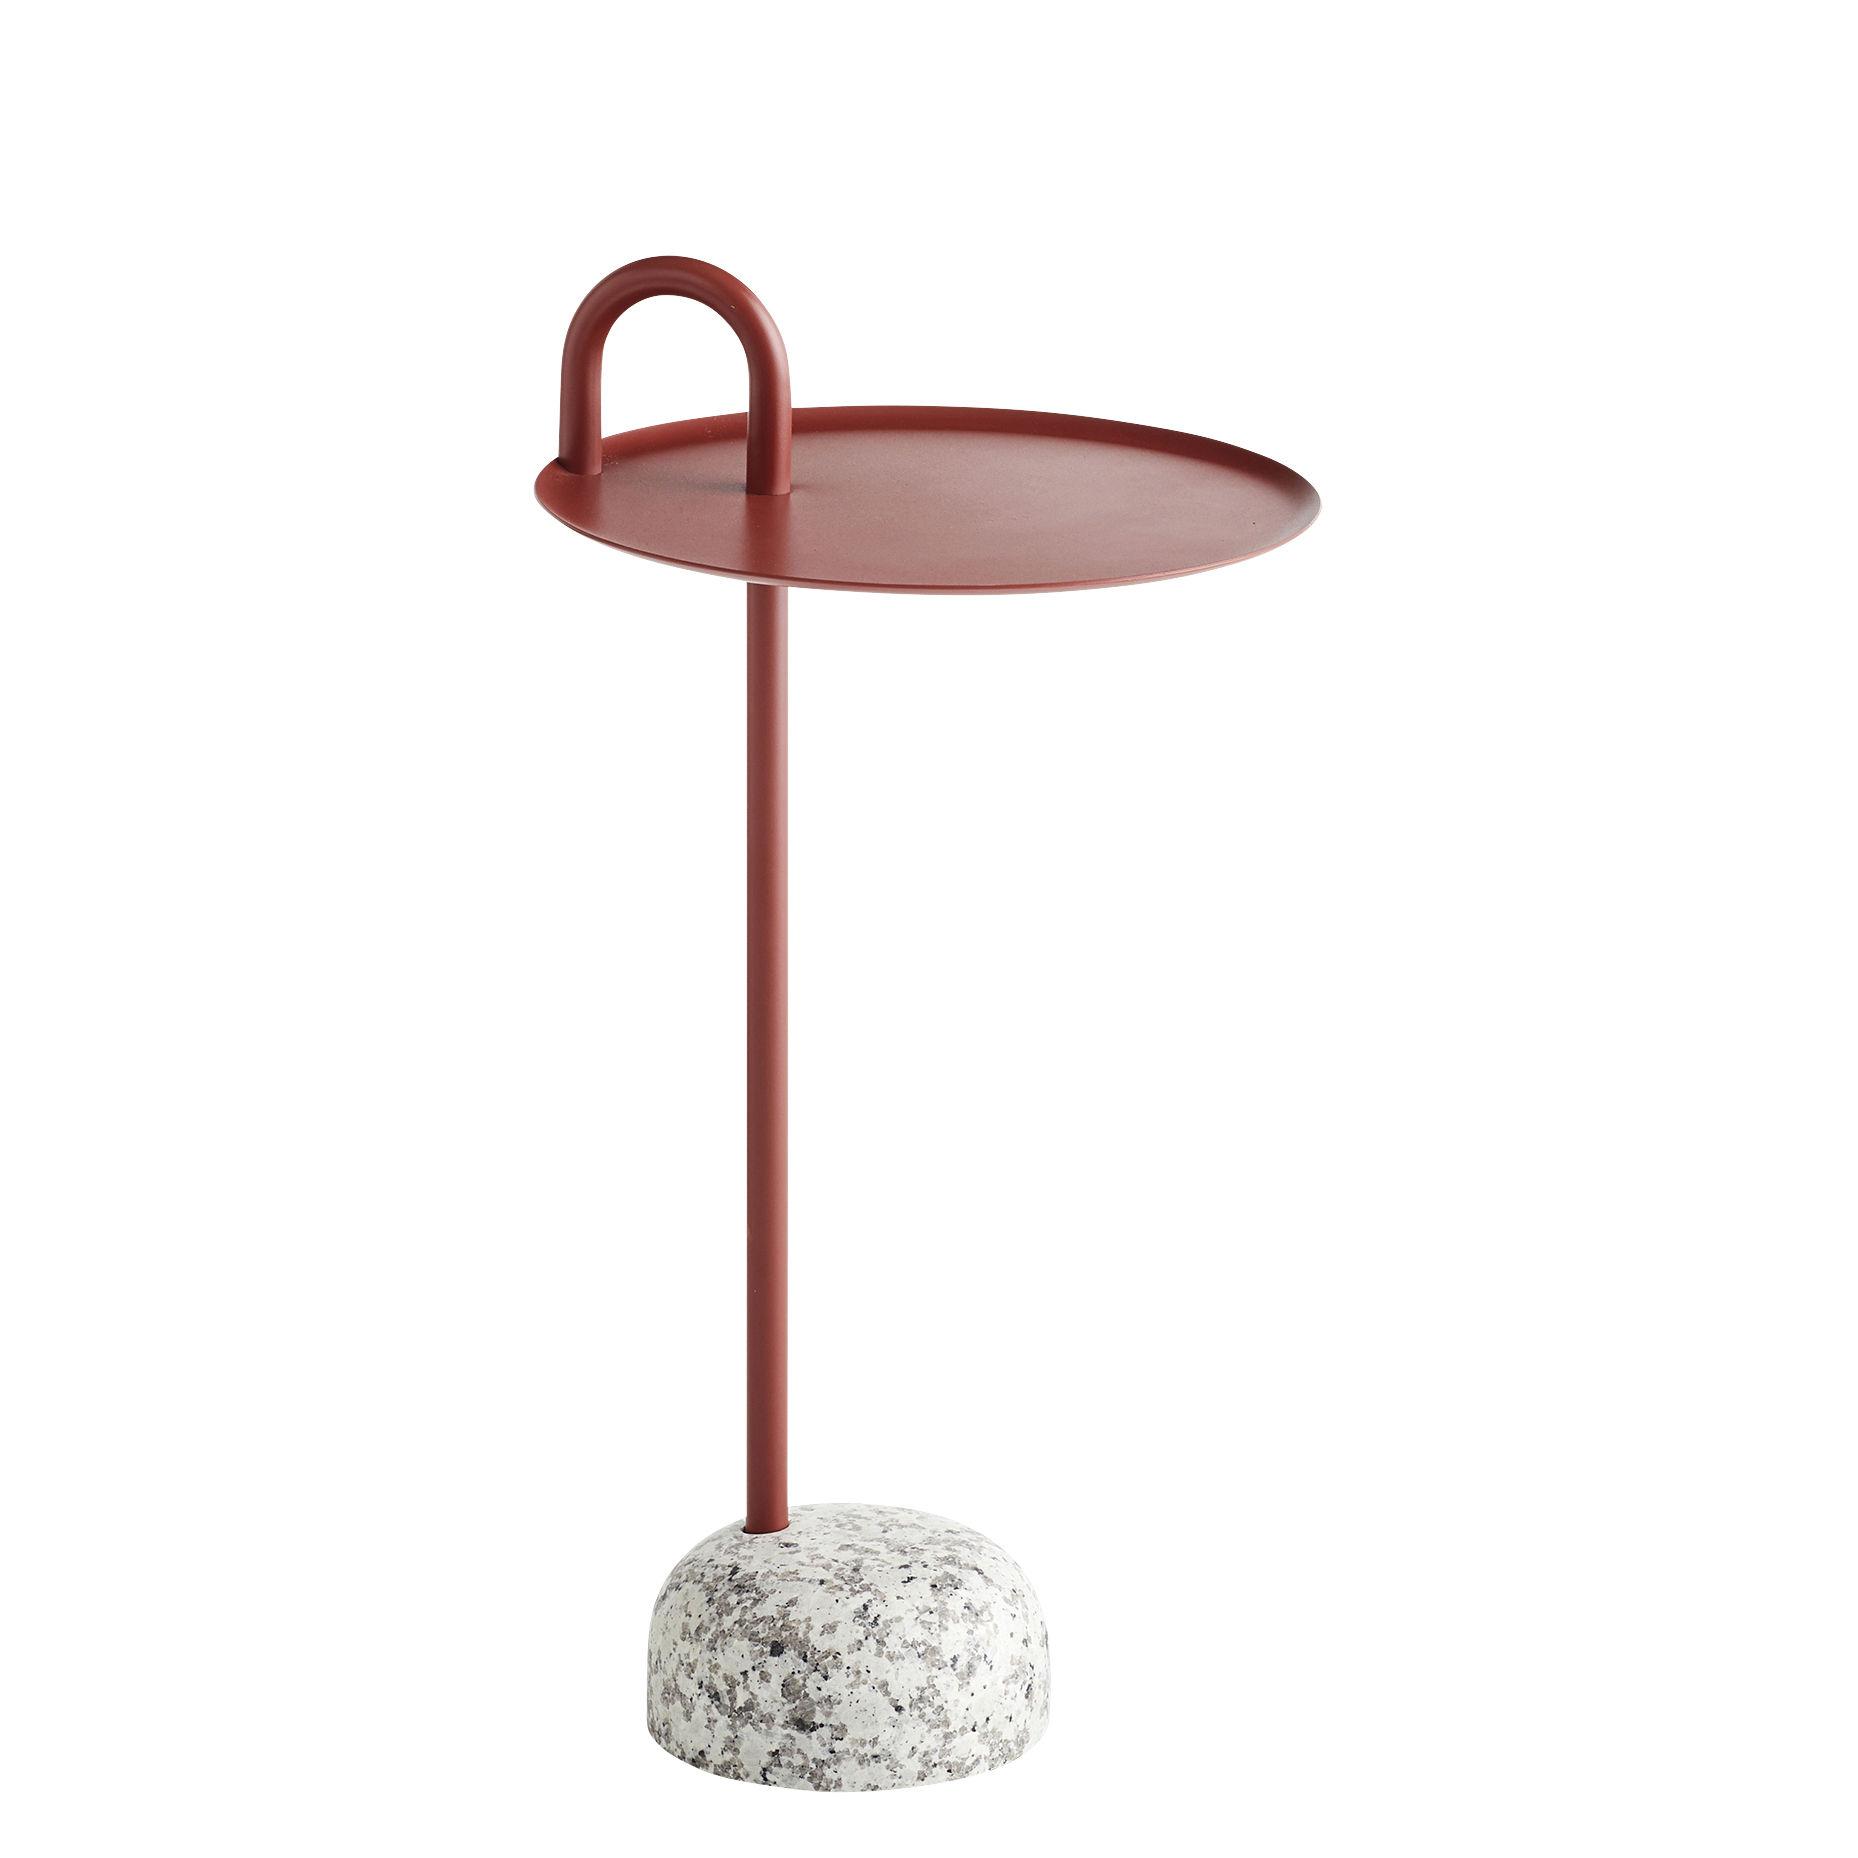 Möbel - Couchtische - Bowler Beistelltisch / Metall & Granit - Hay - Rot / Granit grau - Acier laqué époxy, Granit